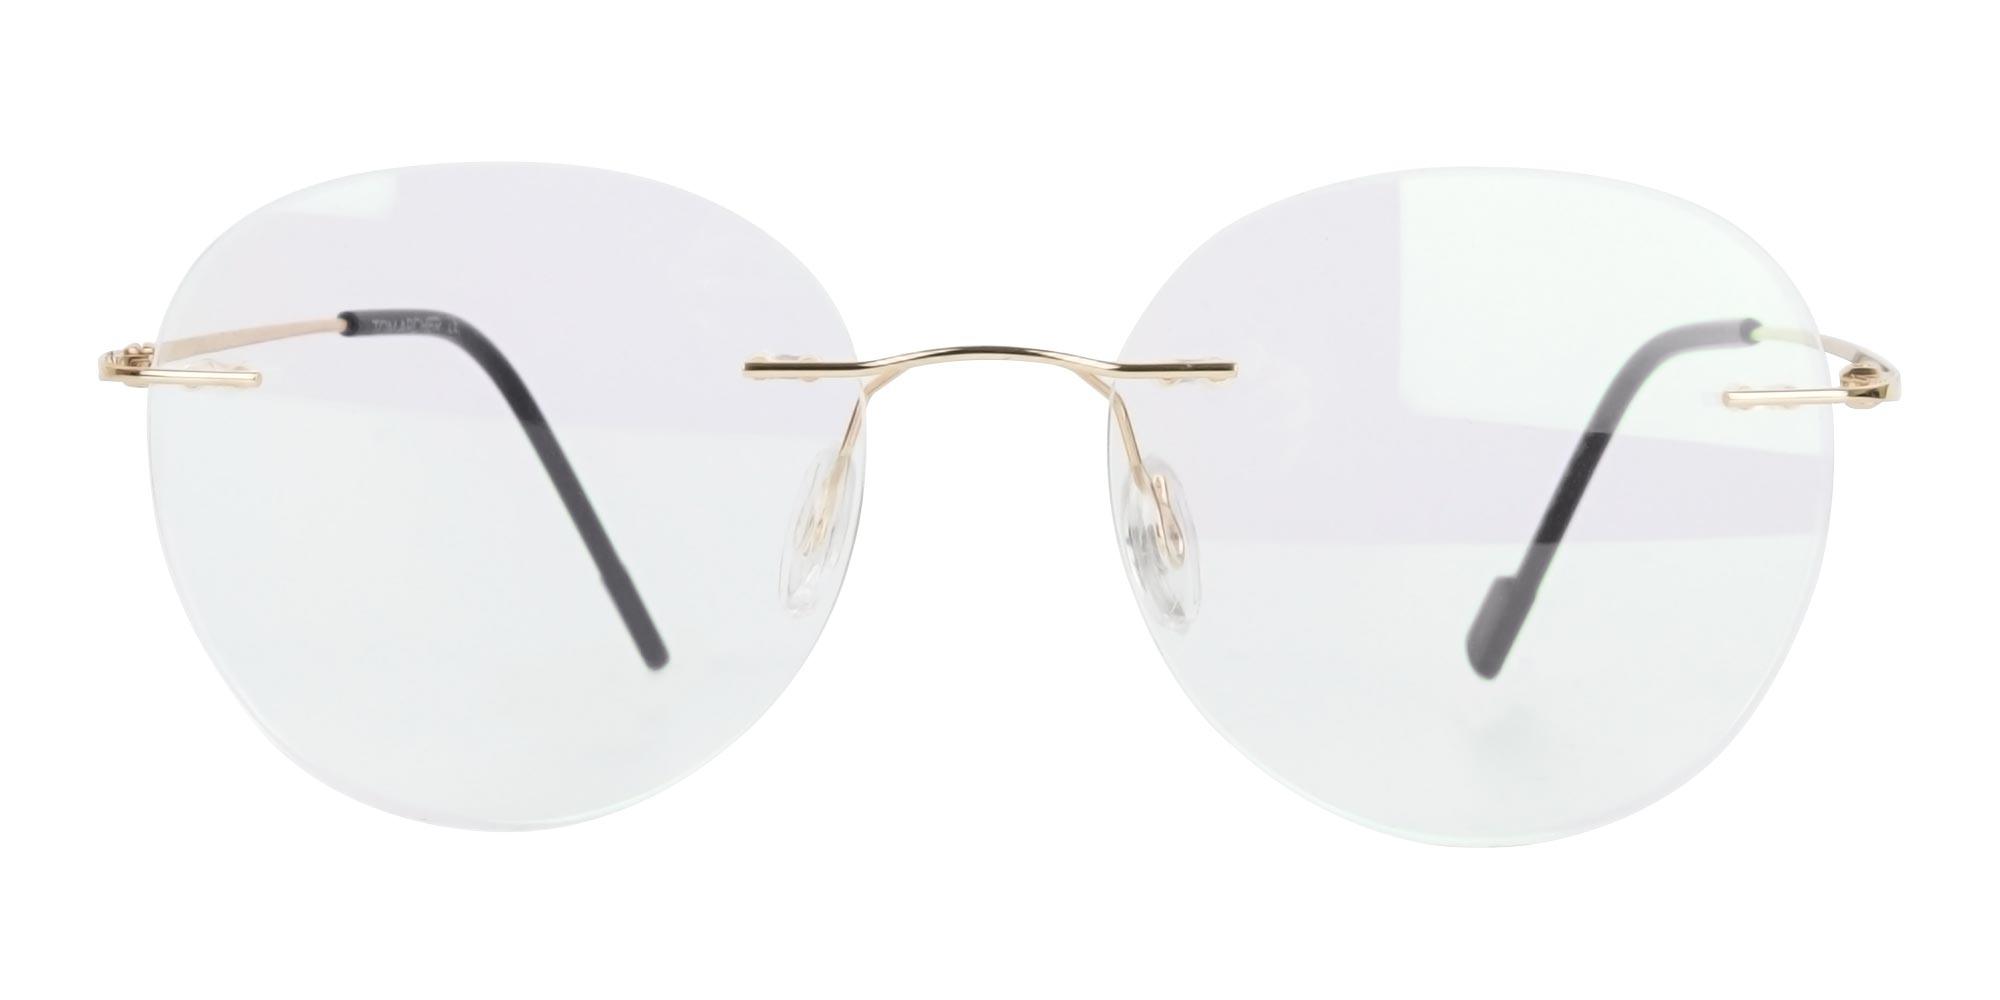 Round Rimless Glasses